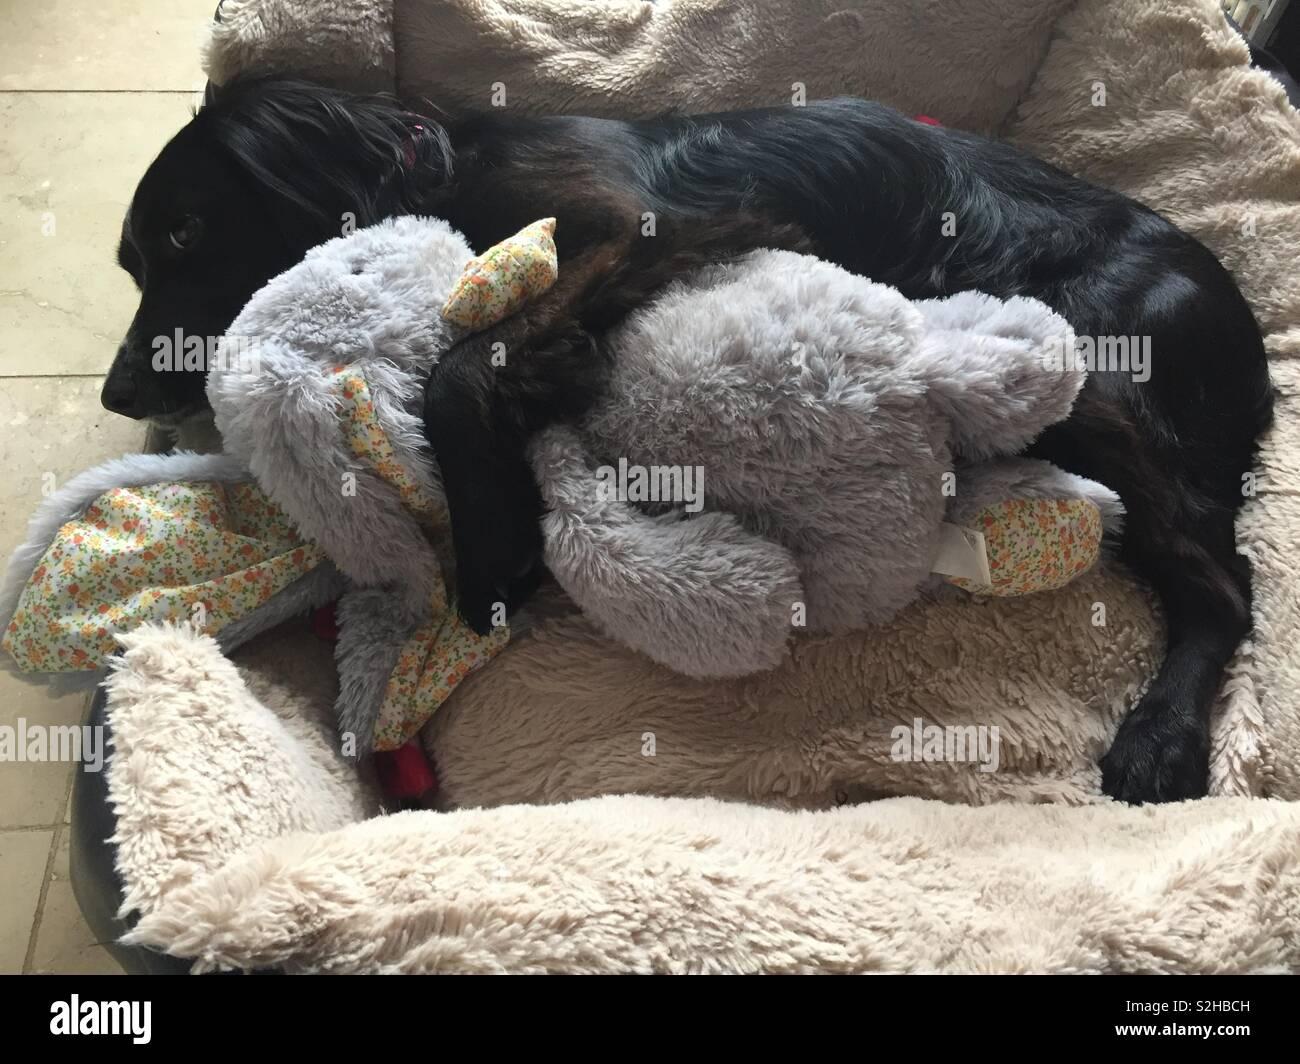 Doggy sprocker spaniel cuddling Easter bunny - Stock Image